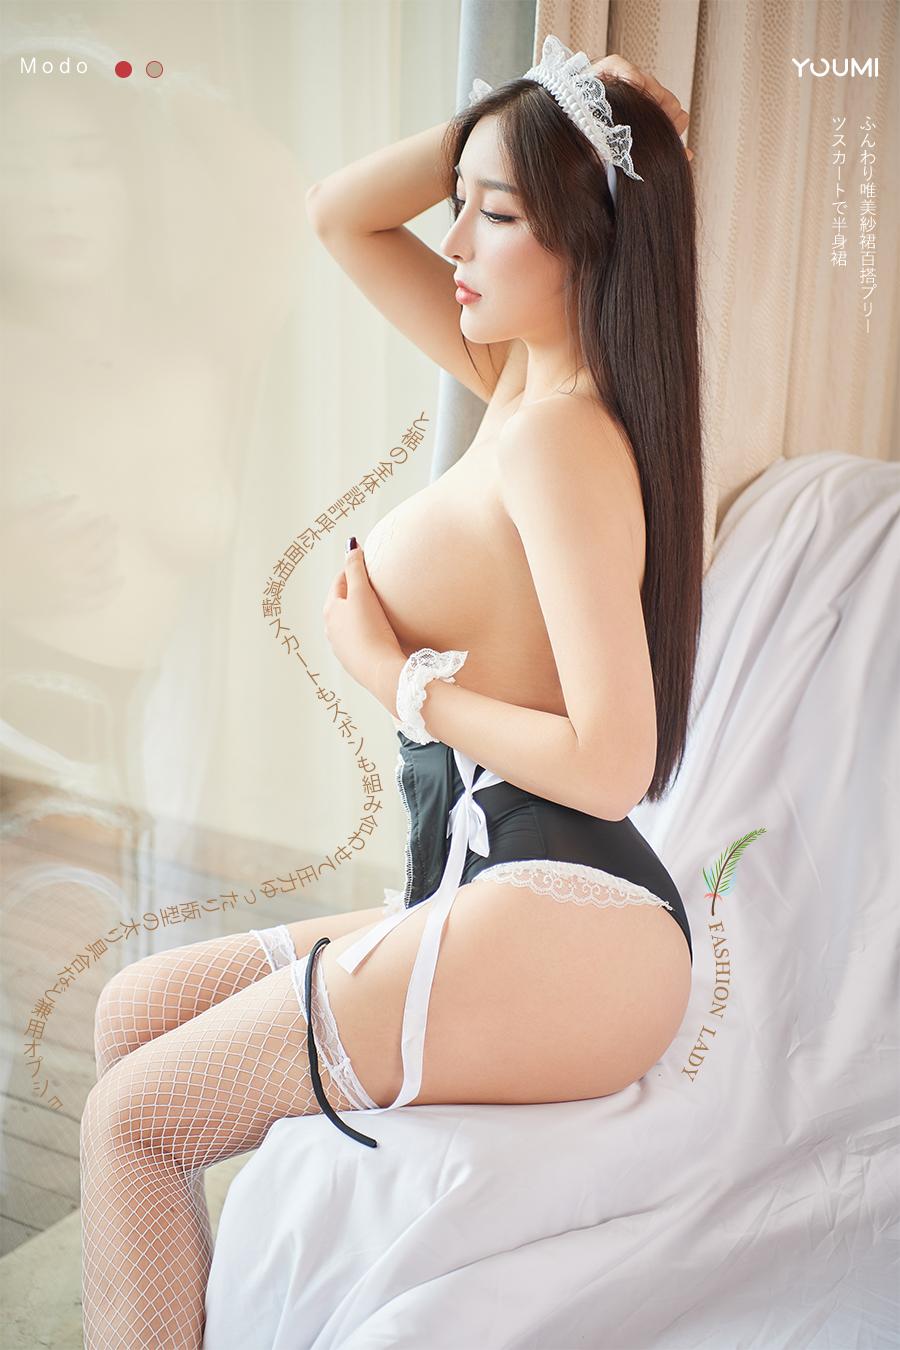 [YouMi尤蜜]2019.09.28 家养女仆 李师师[/21MB]